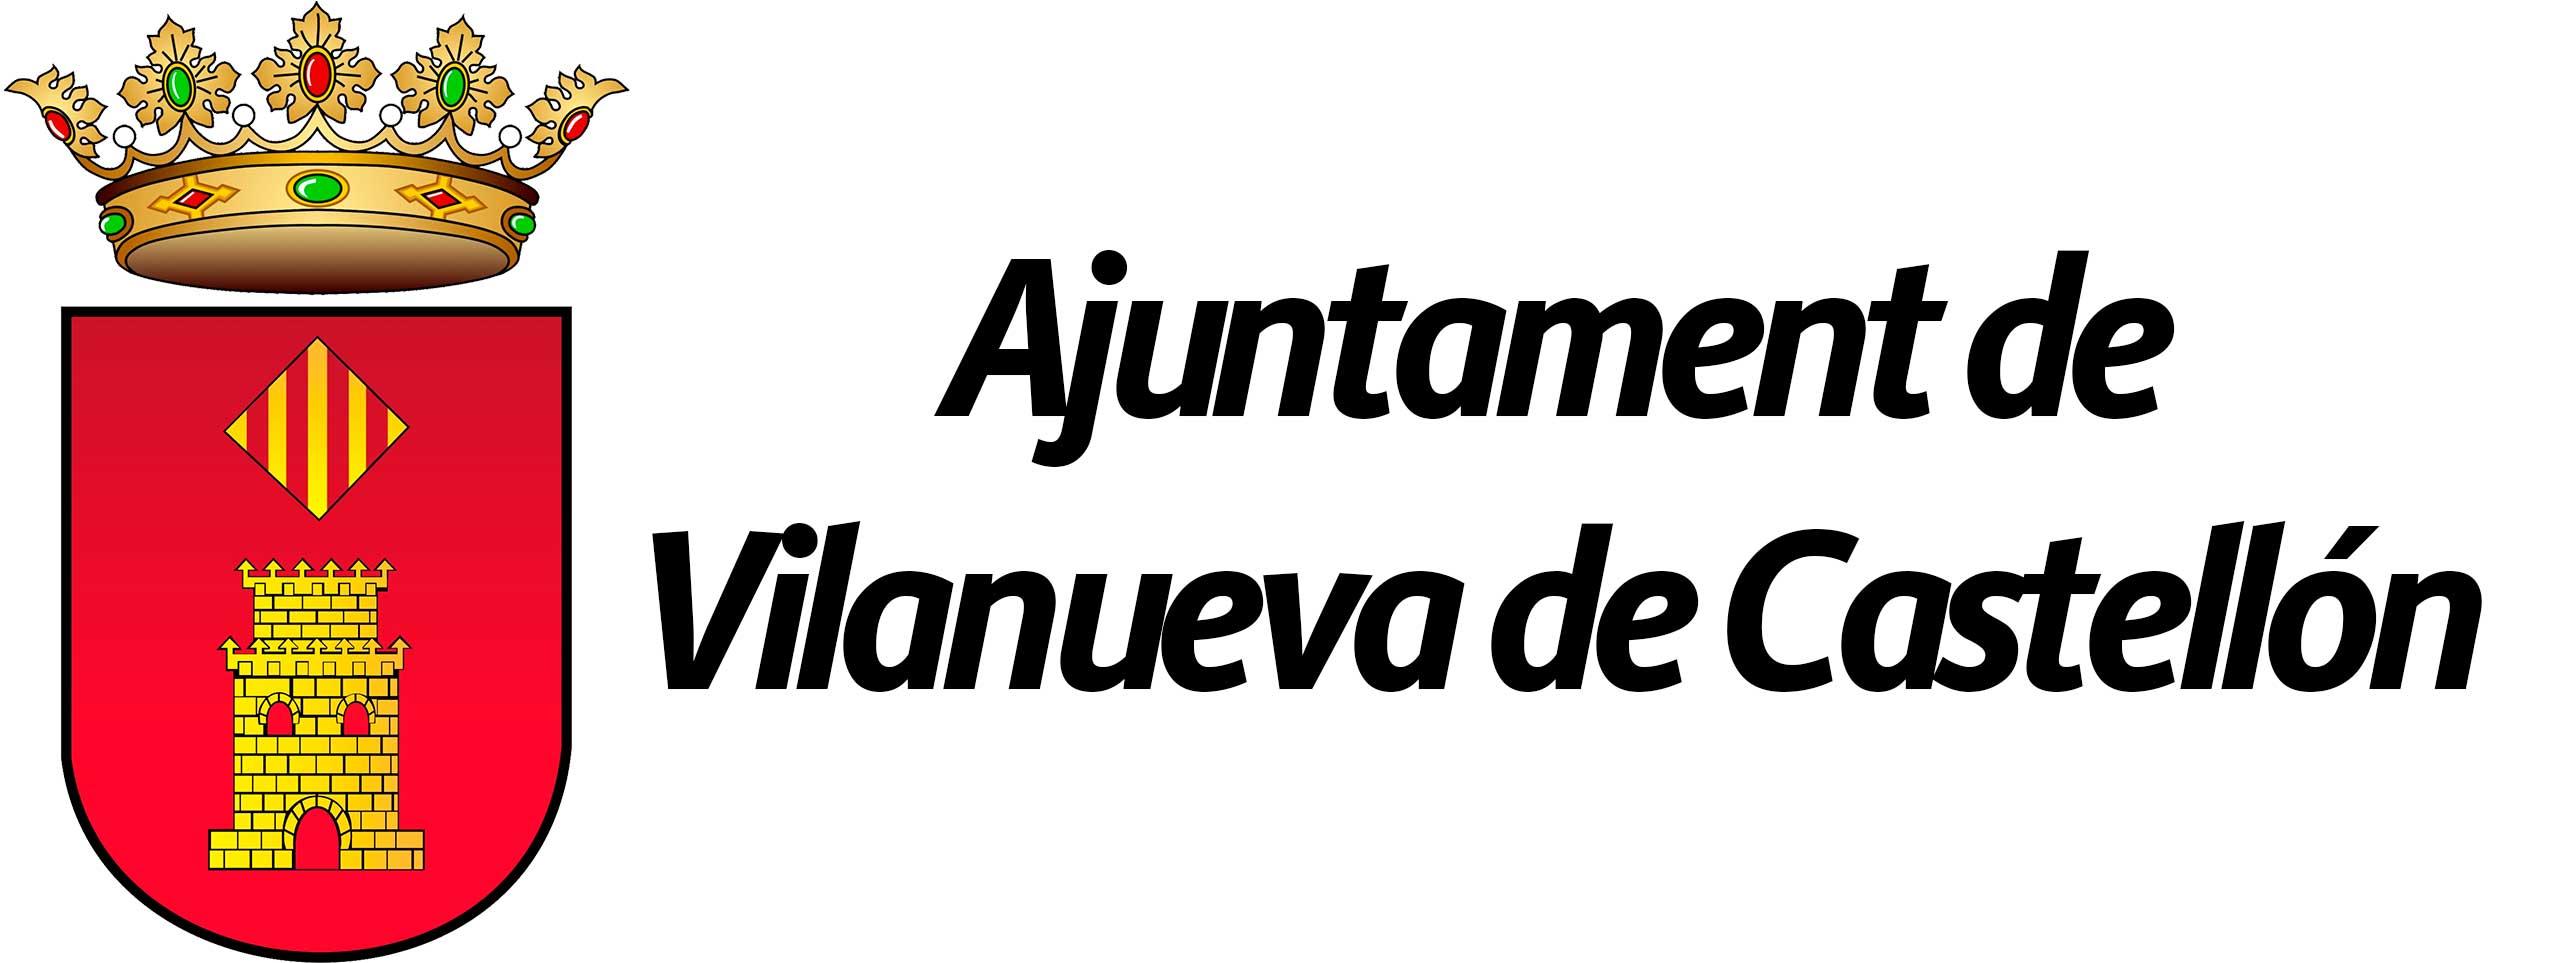 https://www.elcastellet.org/wp-content/uploads/2020/06/AjuntamentCastelló.jpg